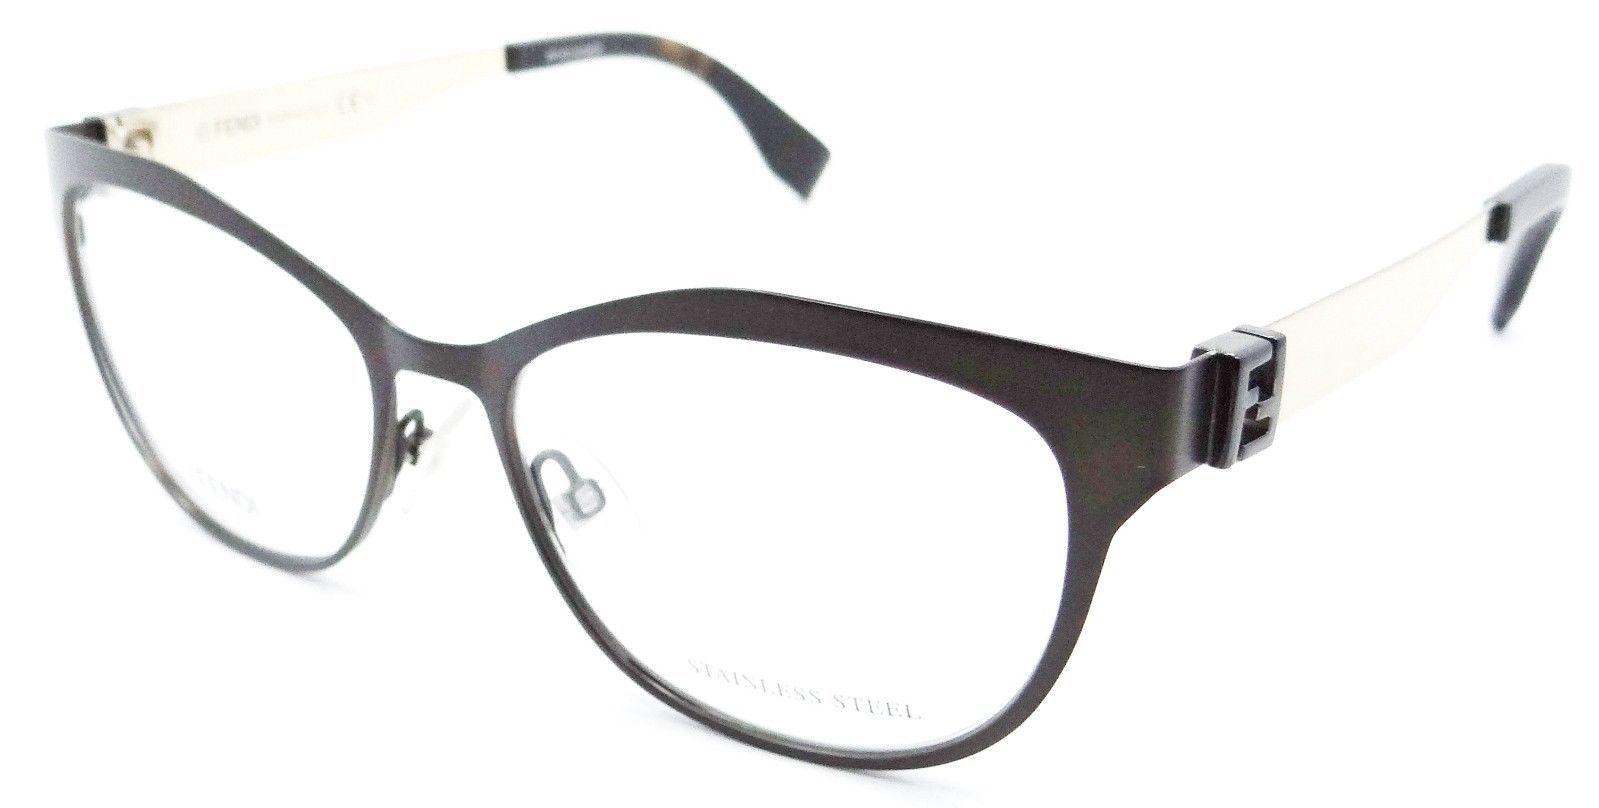 7c53b8bf46f Fendi Rx Eyeglasses Frames FF 0114 H2O and 50 similar items